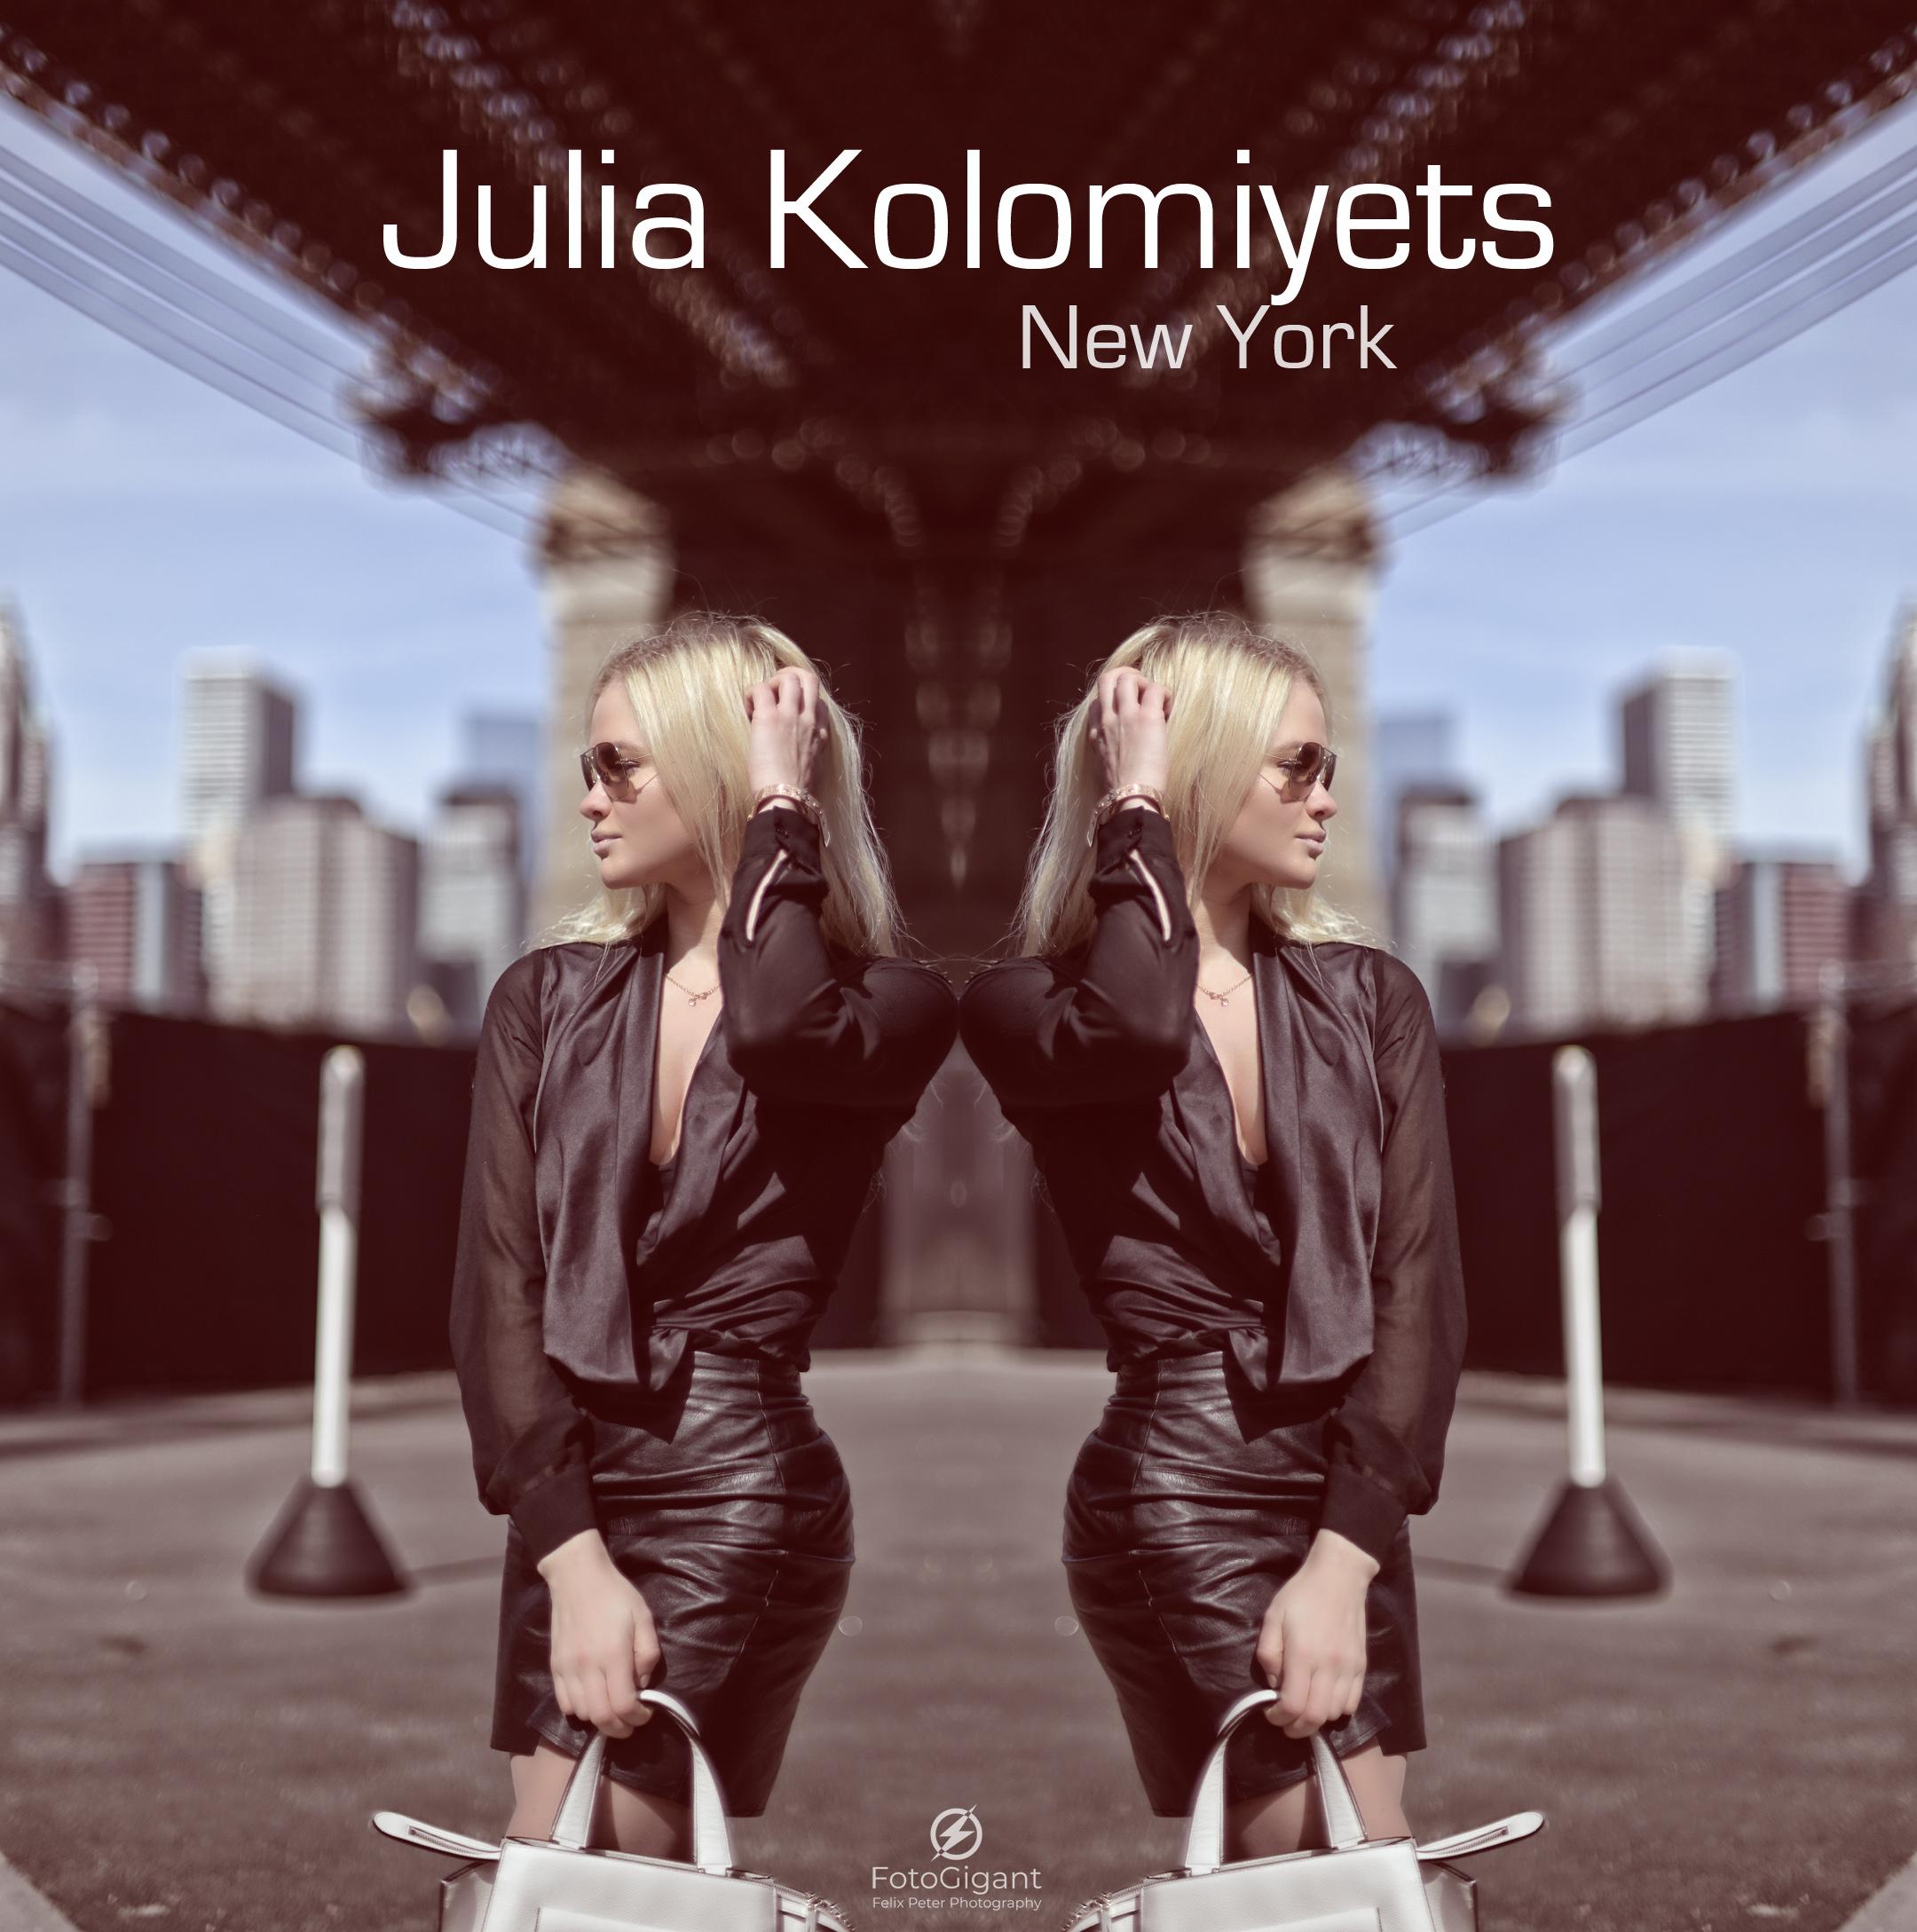 NewYork_JuliaKolomiyets_Fashionphotography_24.jpg